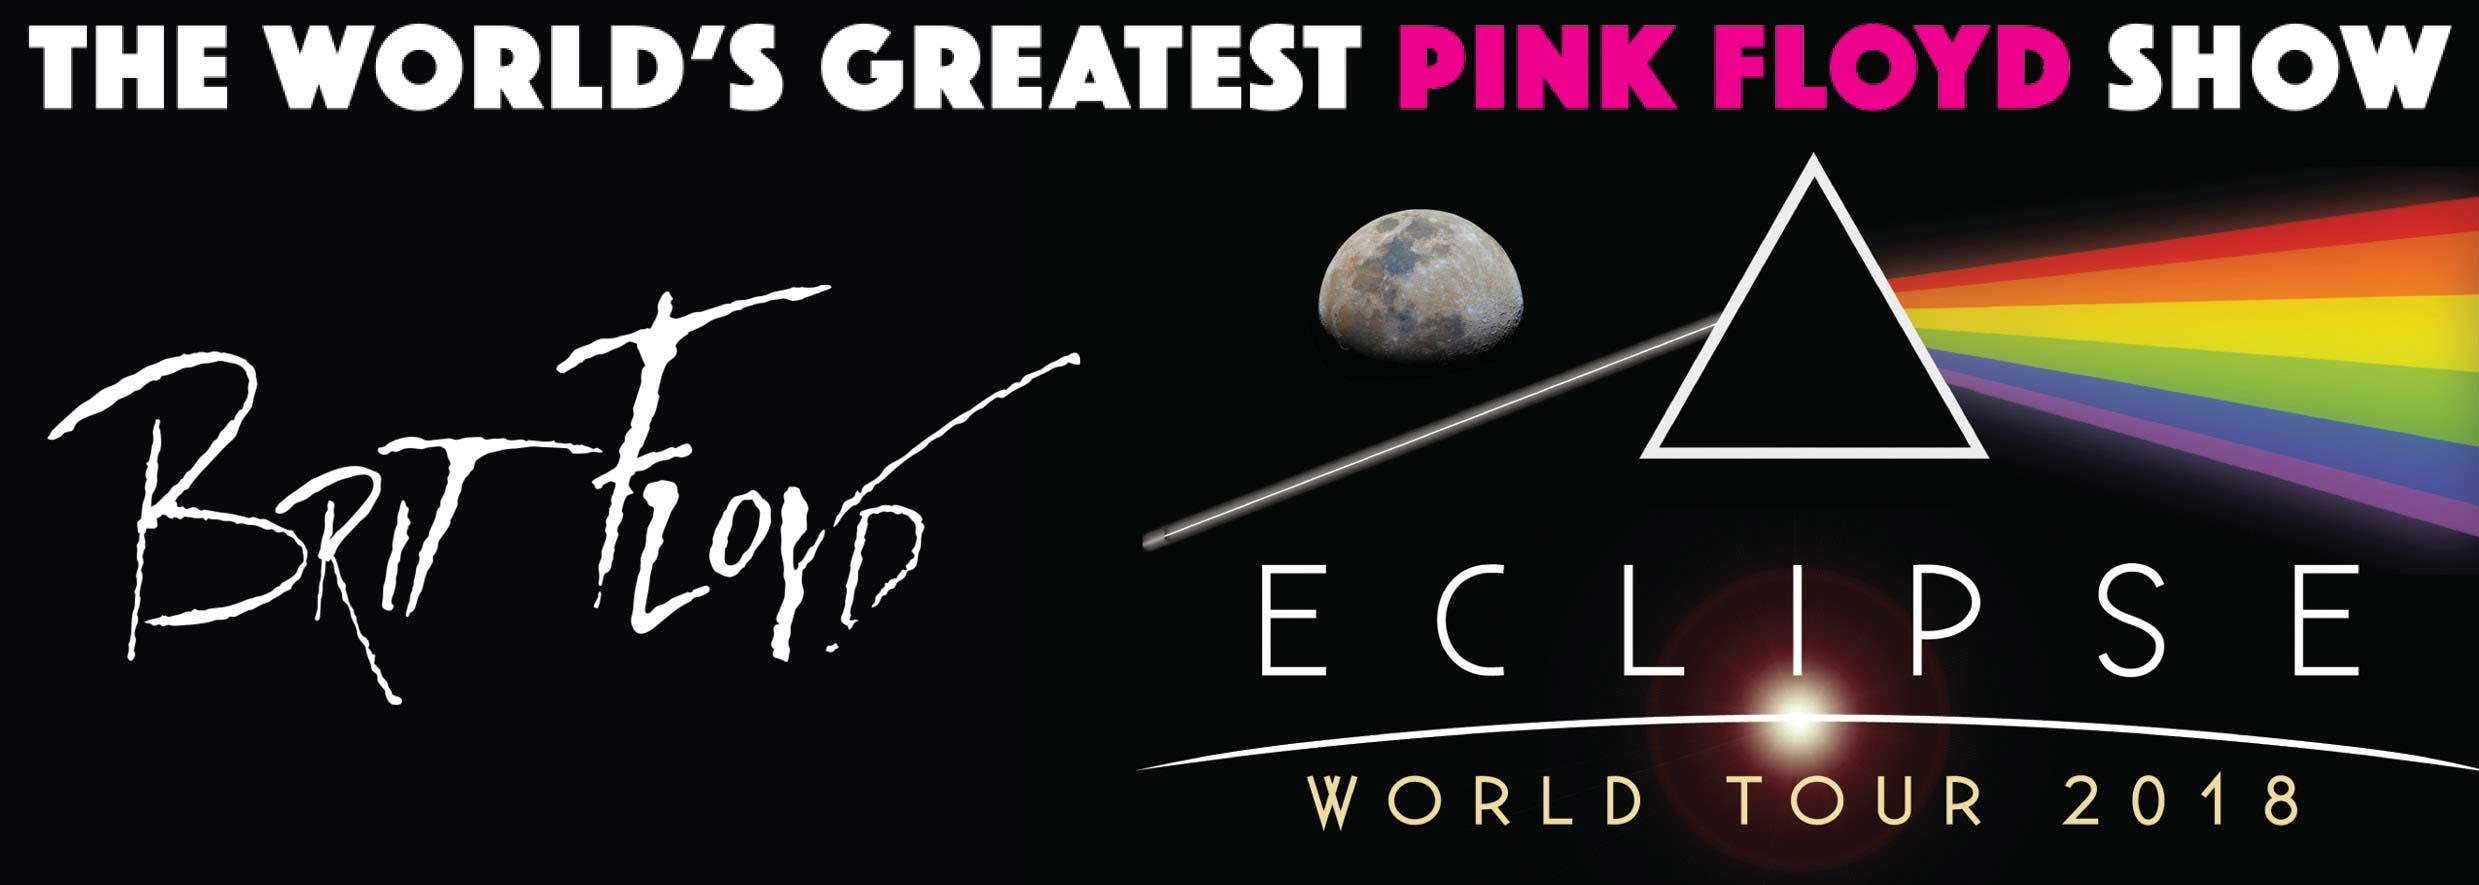 Brit Floyd banner.jpg